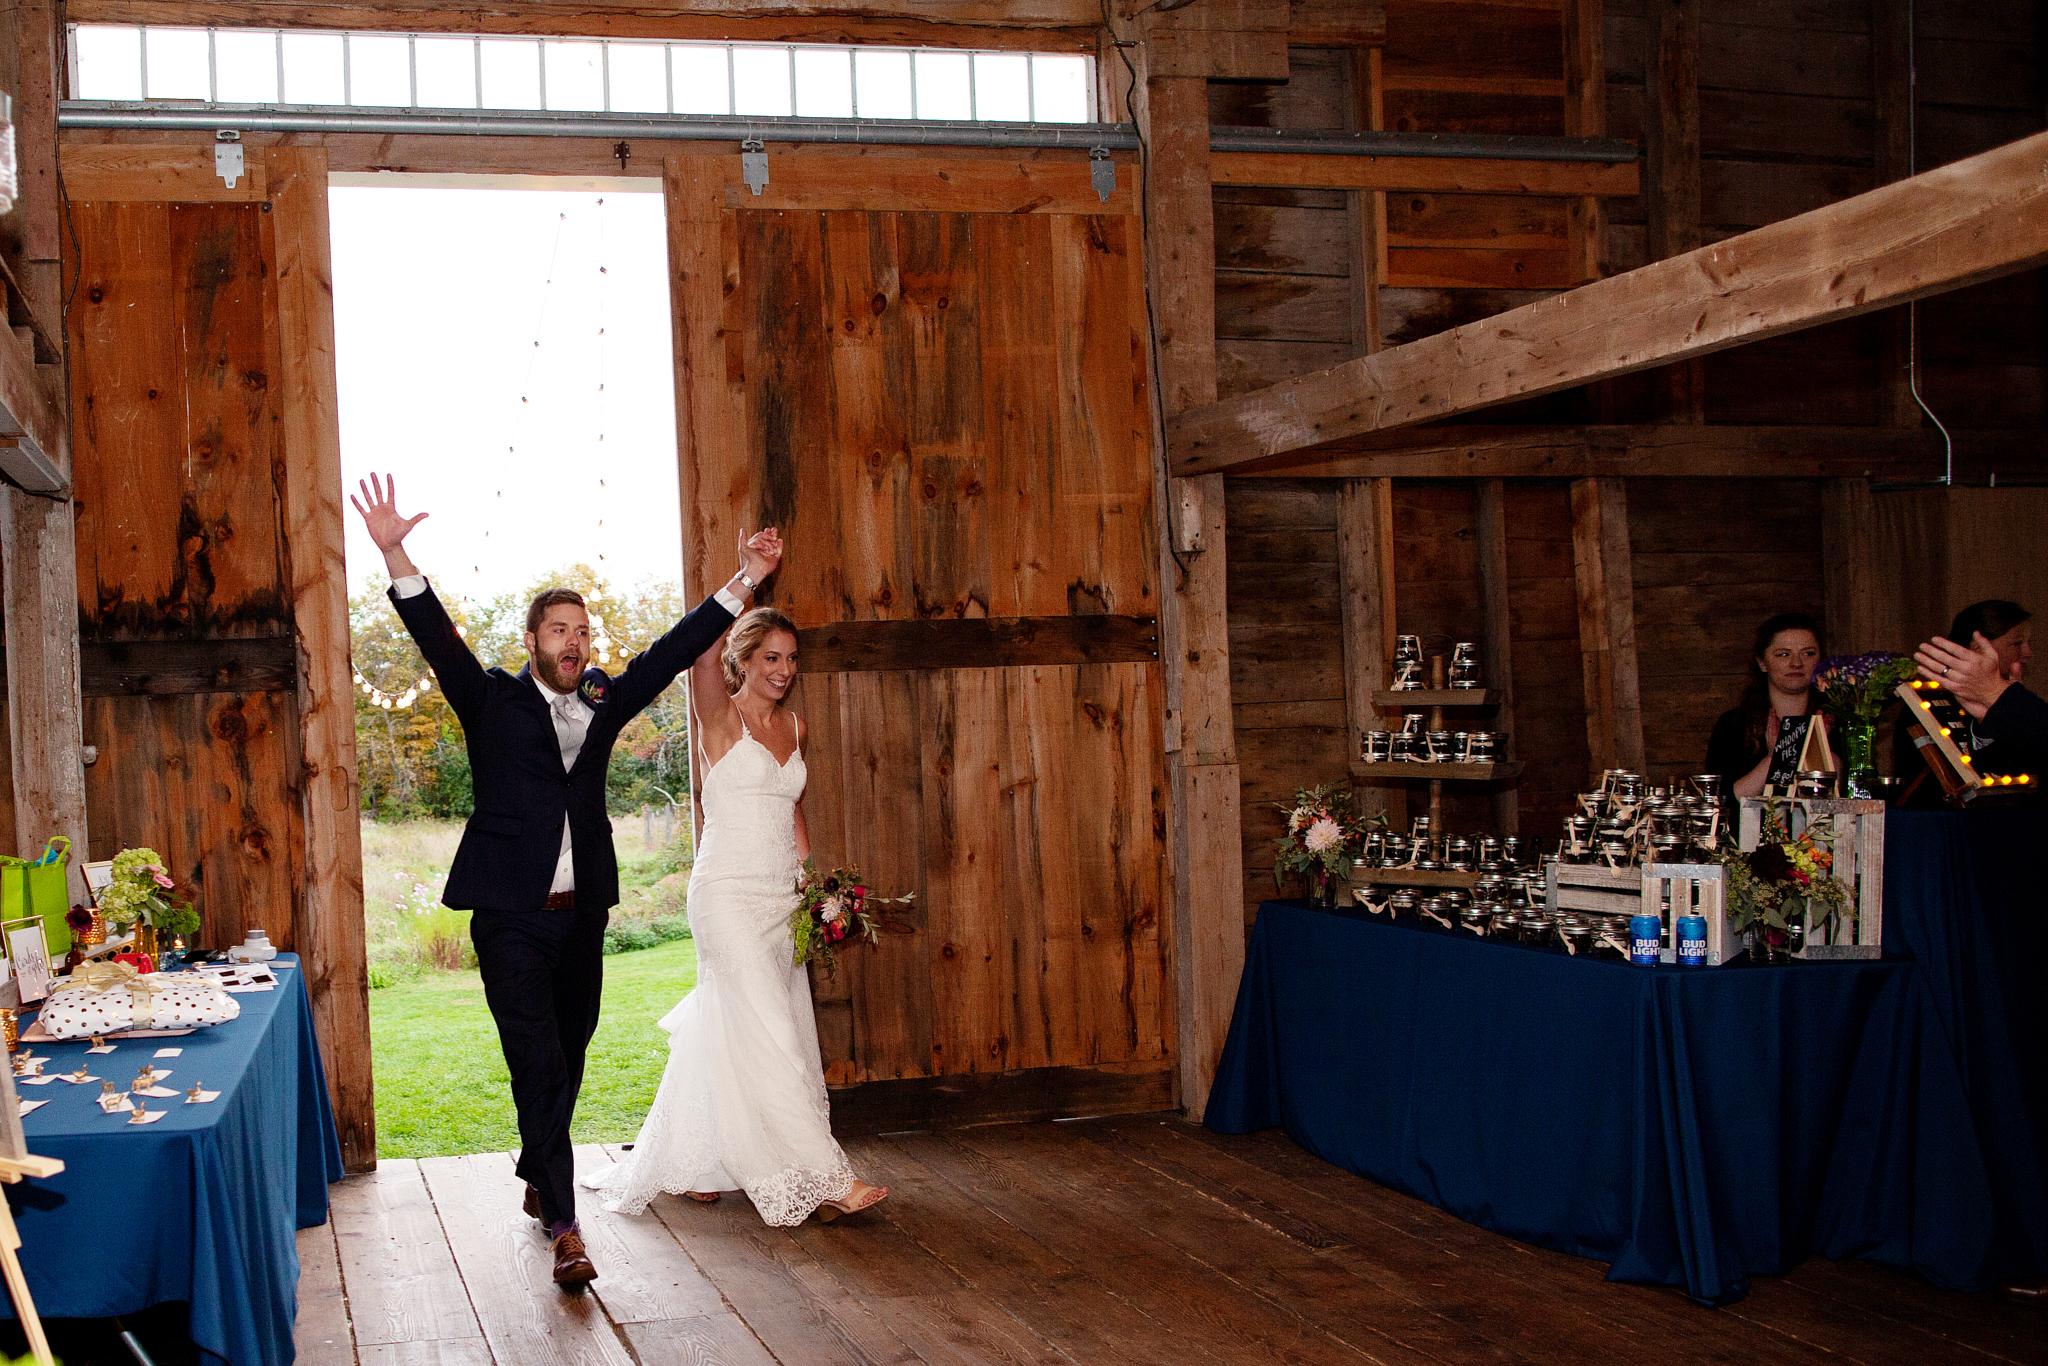 maine-farm-wedding-photographer-stepheneycollins-219.jpg